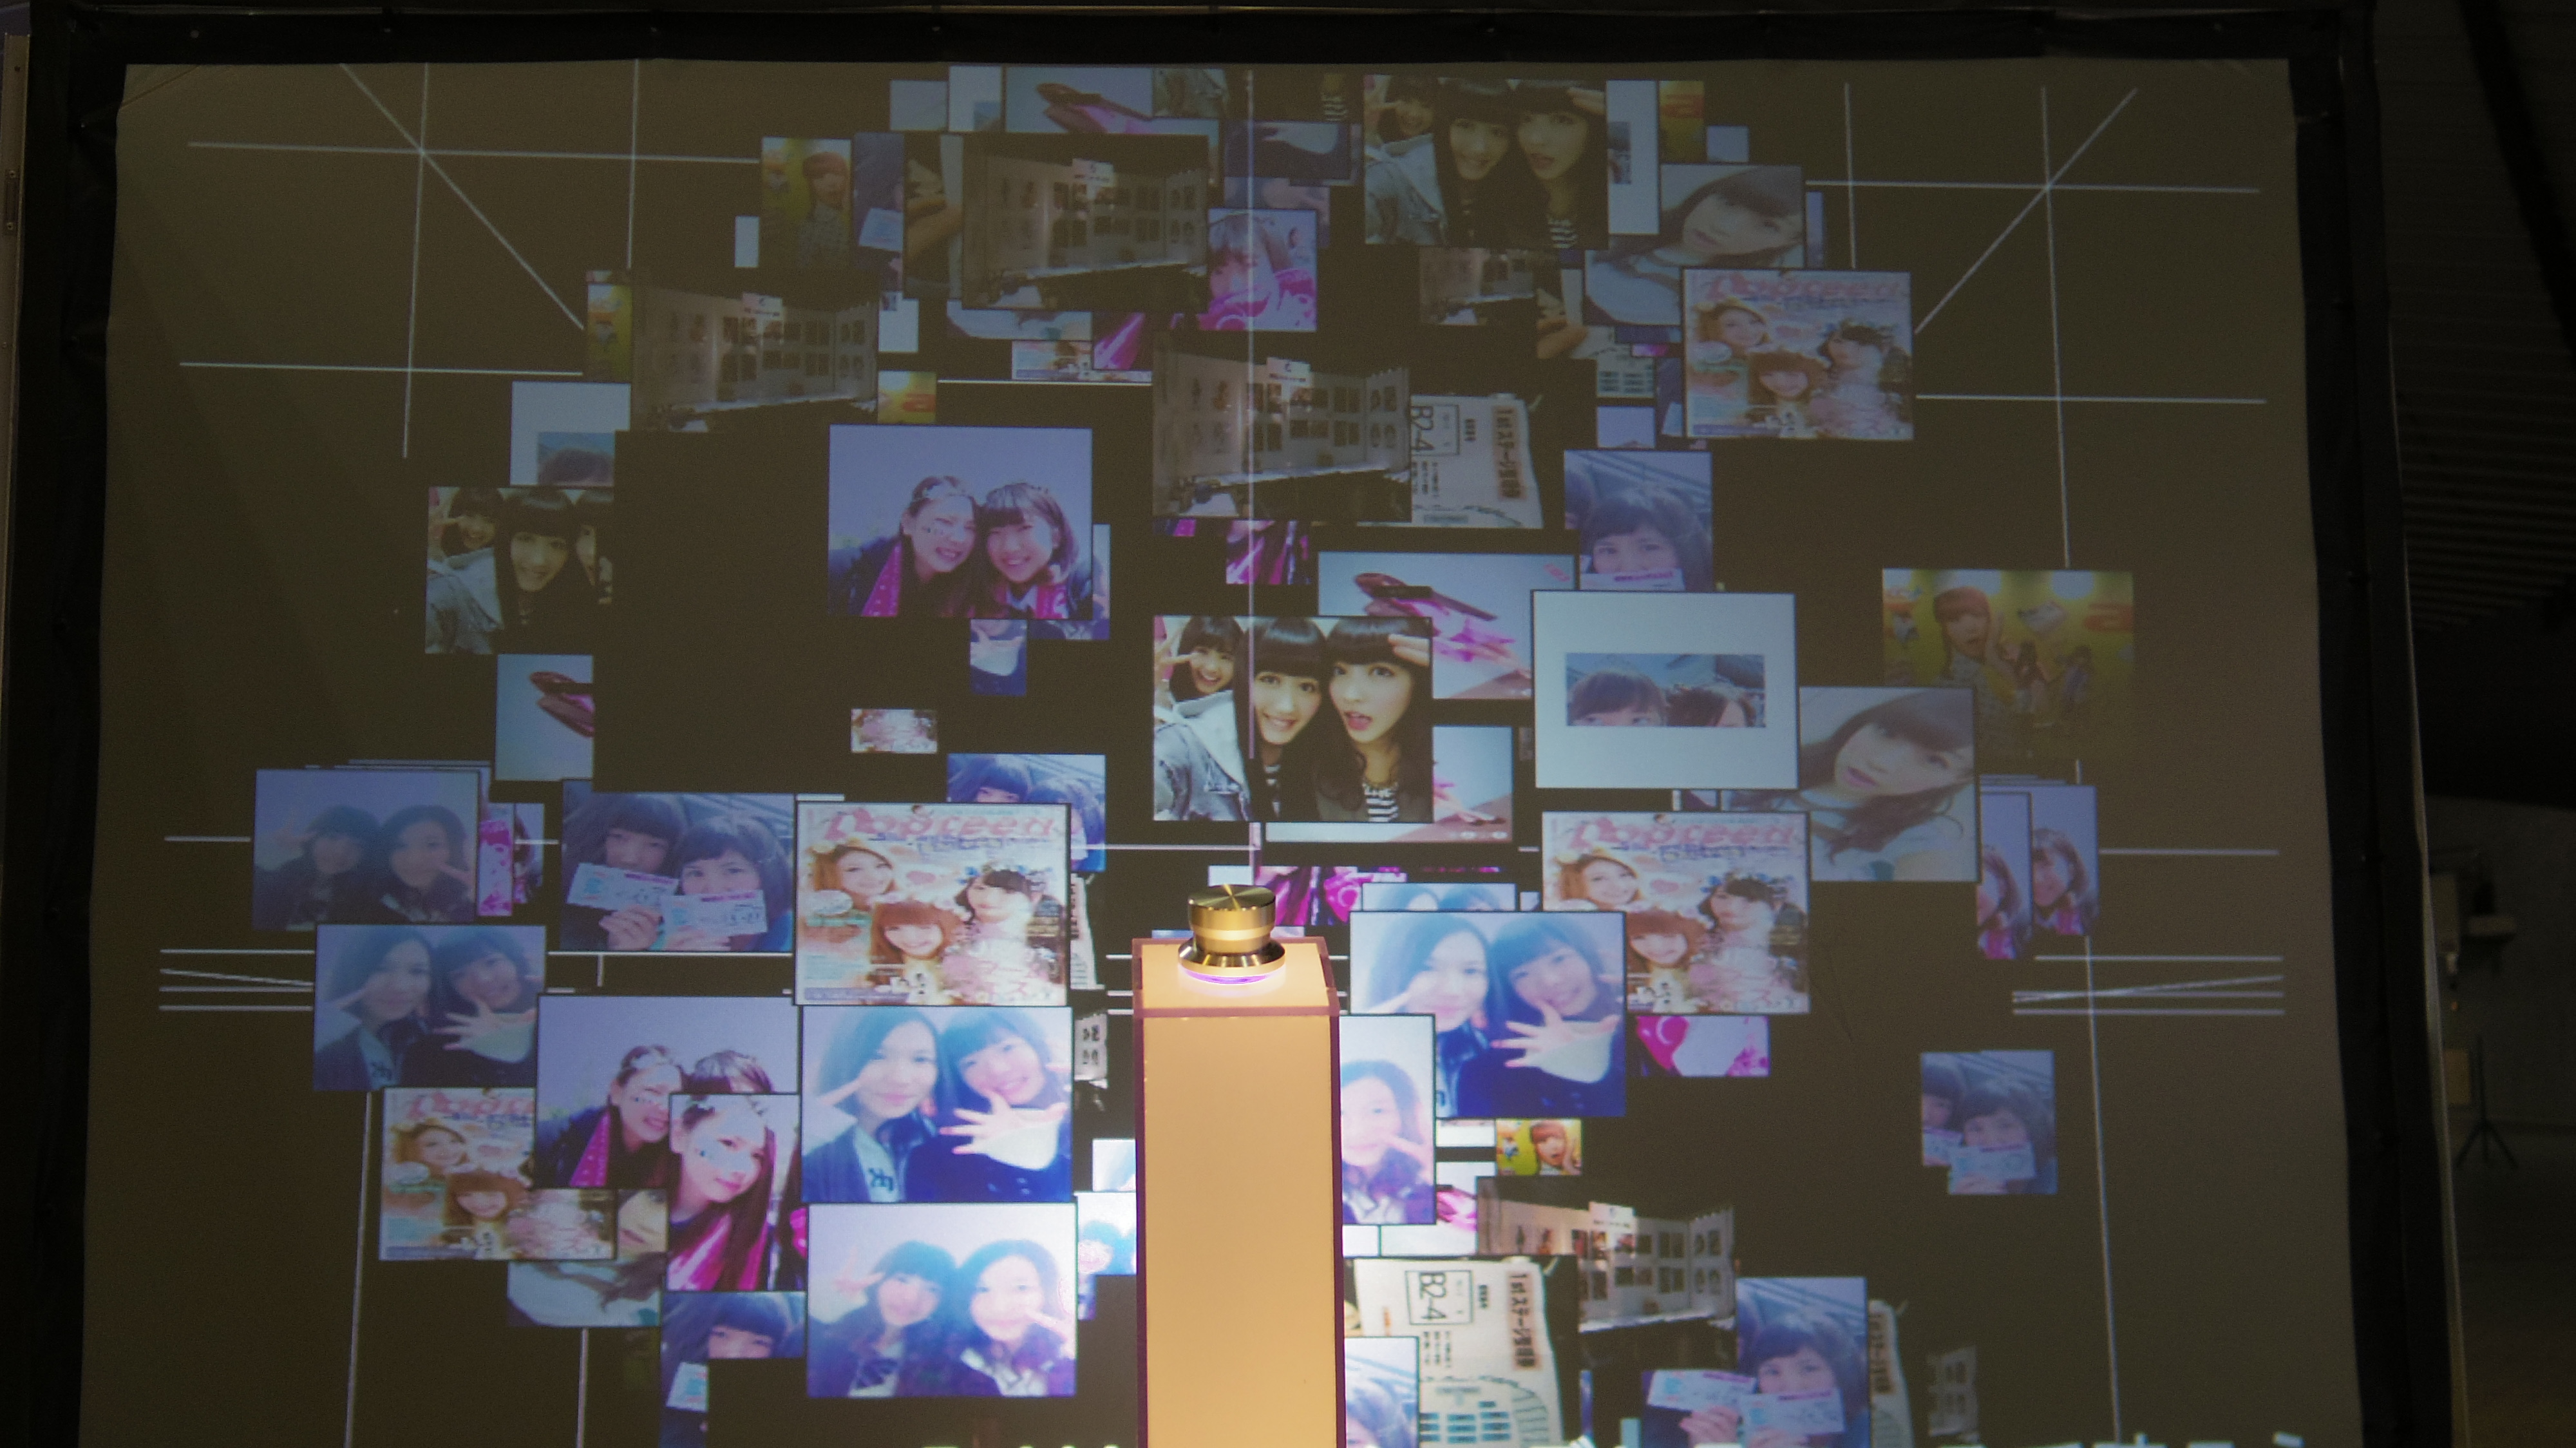 Interactive Photo Viewer Exhibit at